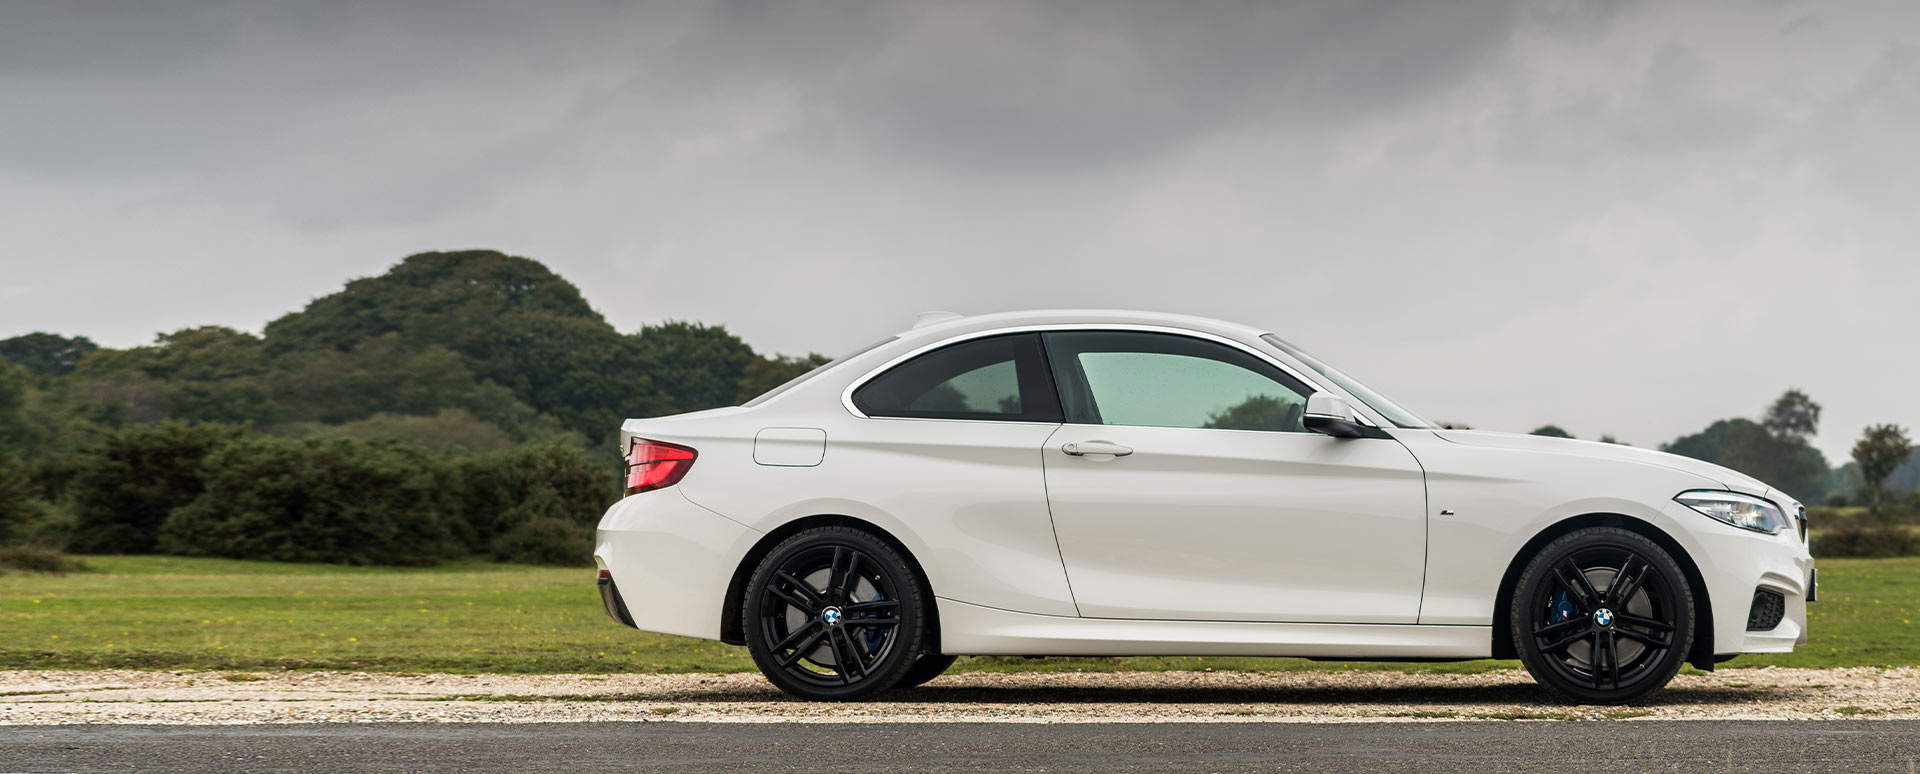 White BMW 2 Series, side profile